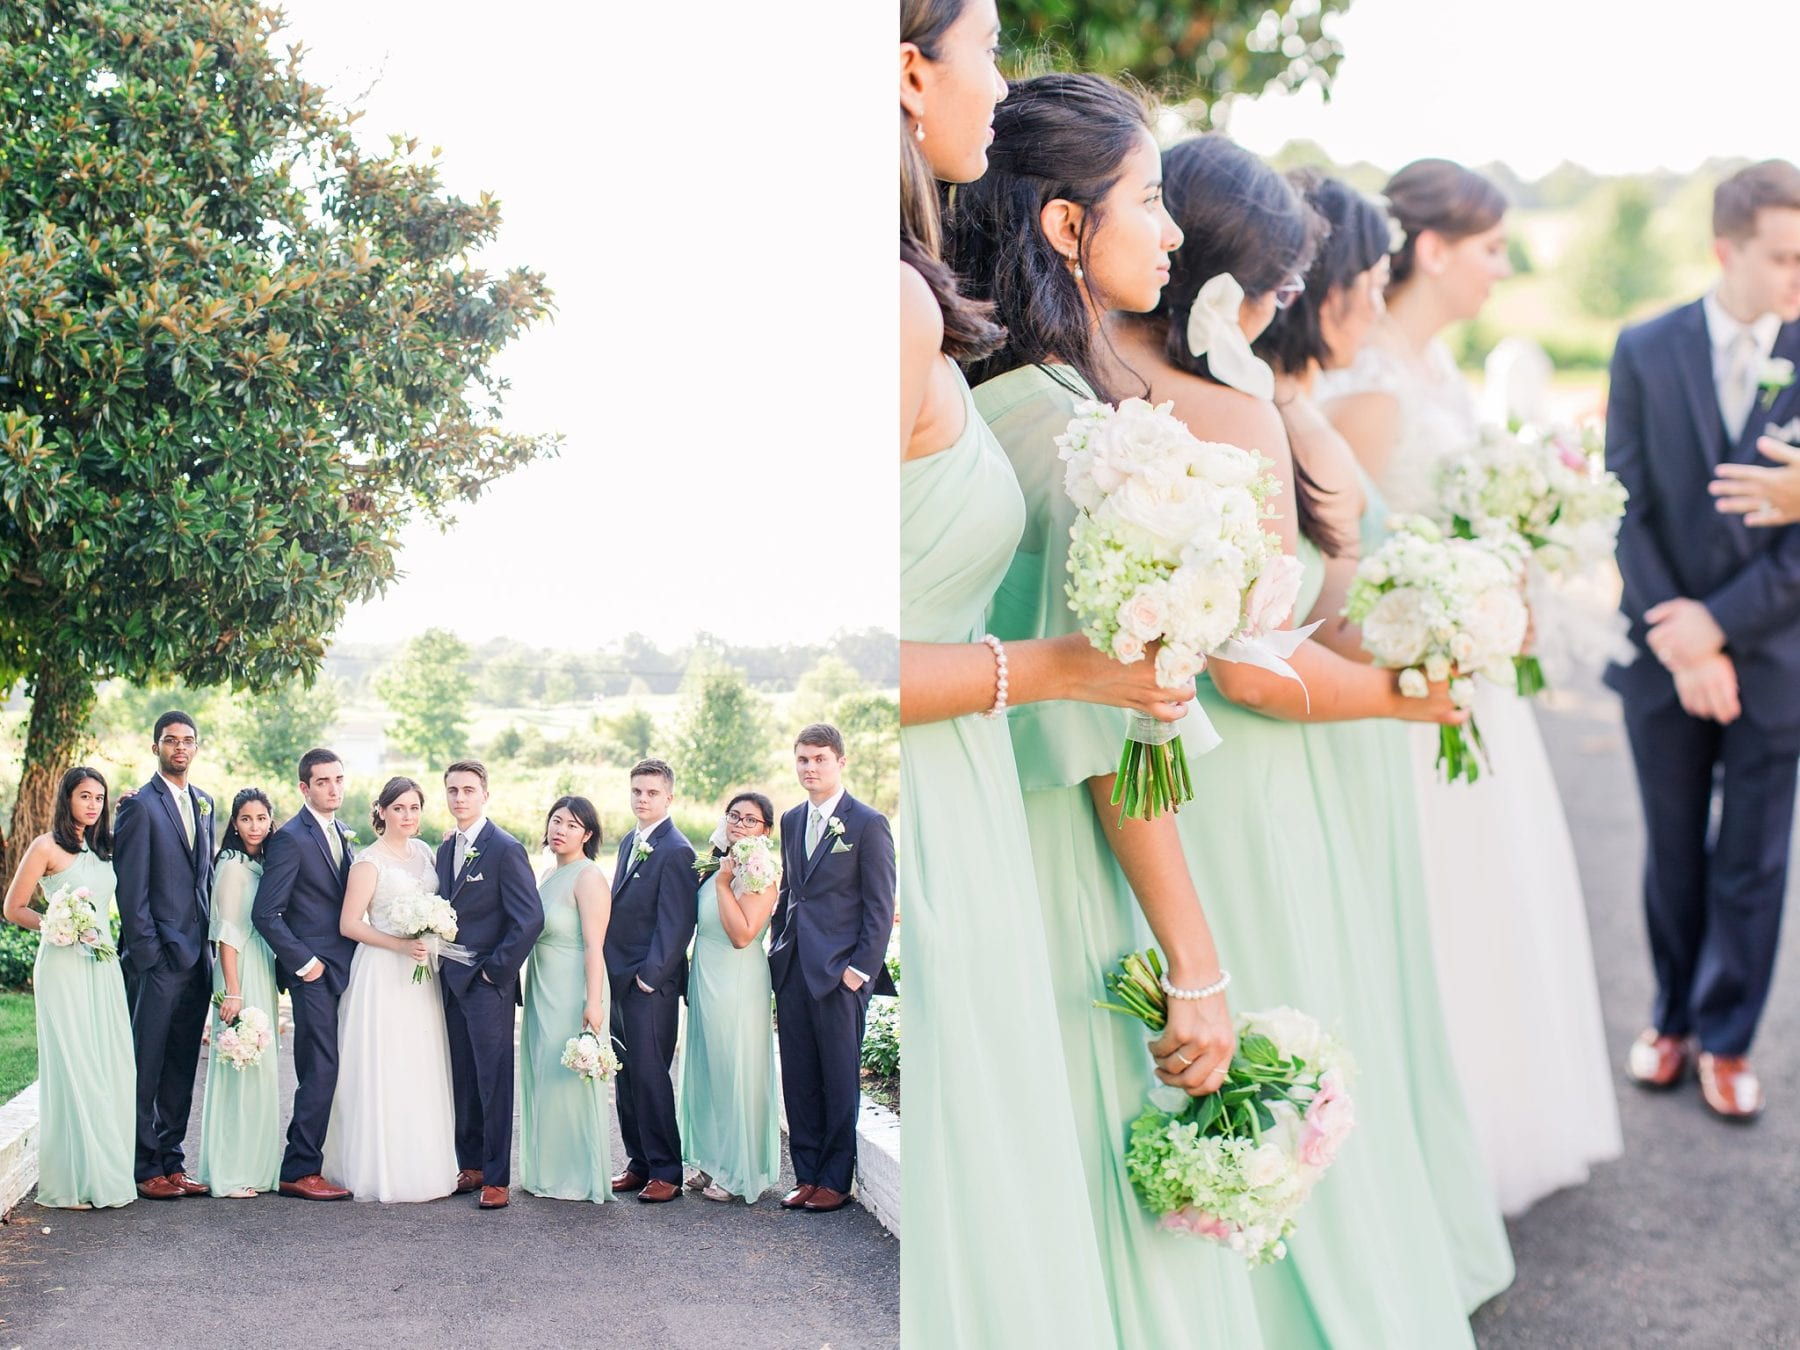 Bristow Manor Wedding Photos Virginia Wedding Photographer Lauren & Andrew Megan Kelsey Photography-445.jpg